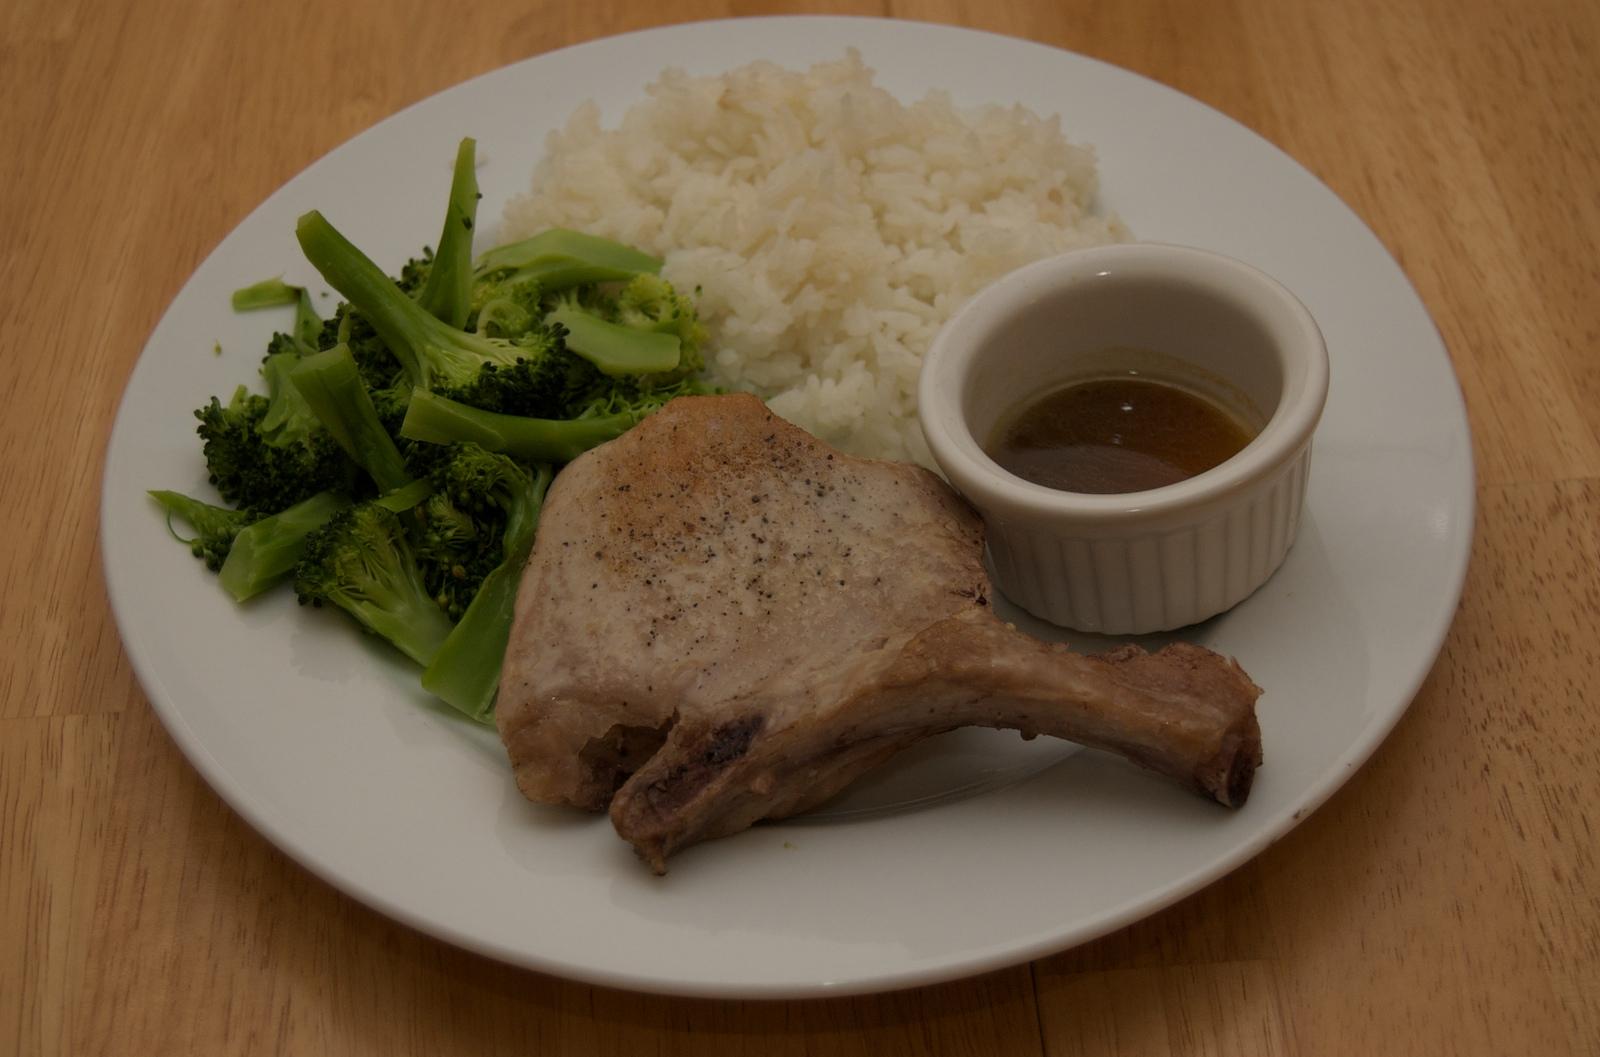 http://blog.rickk.com/food/2010/02/14/pork1.jpg